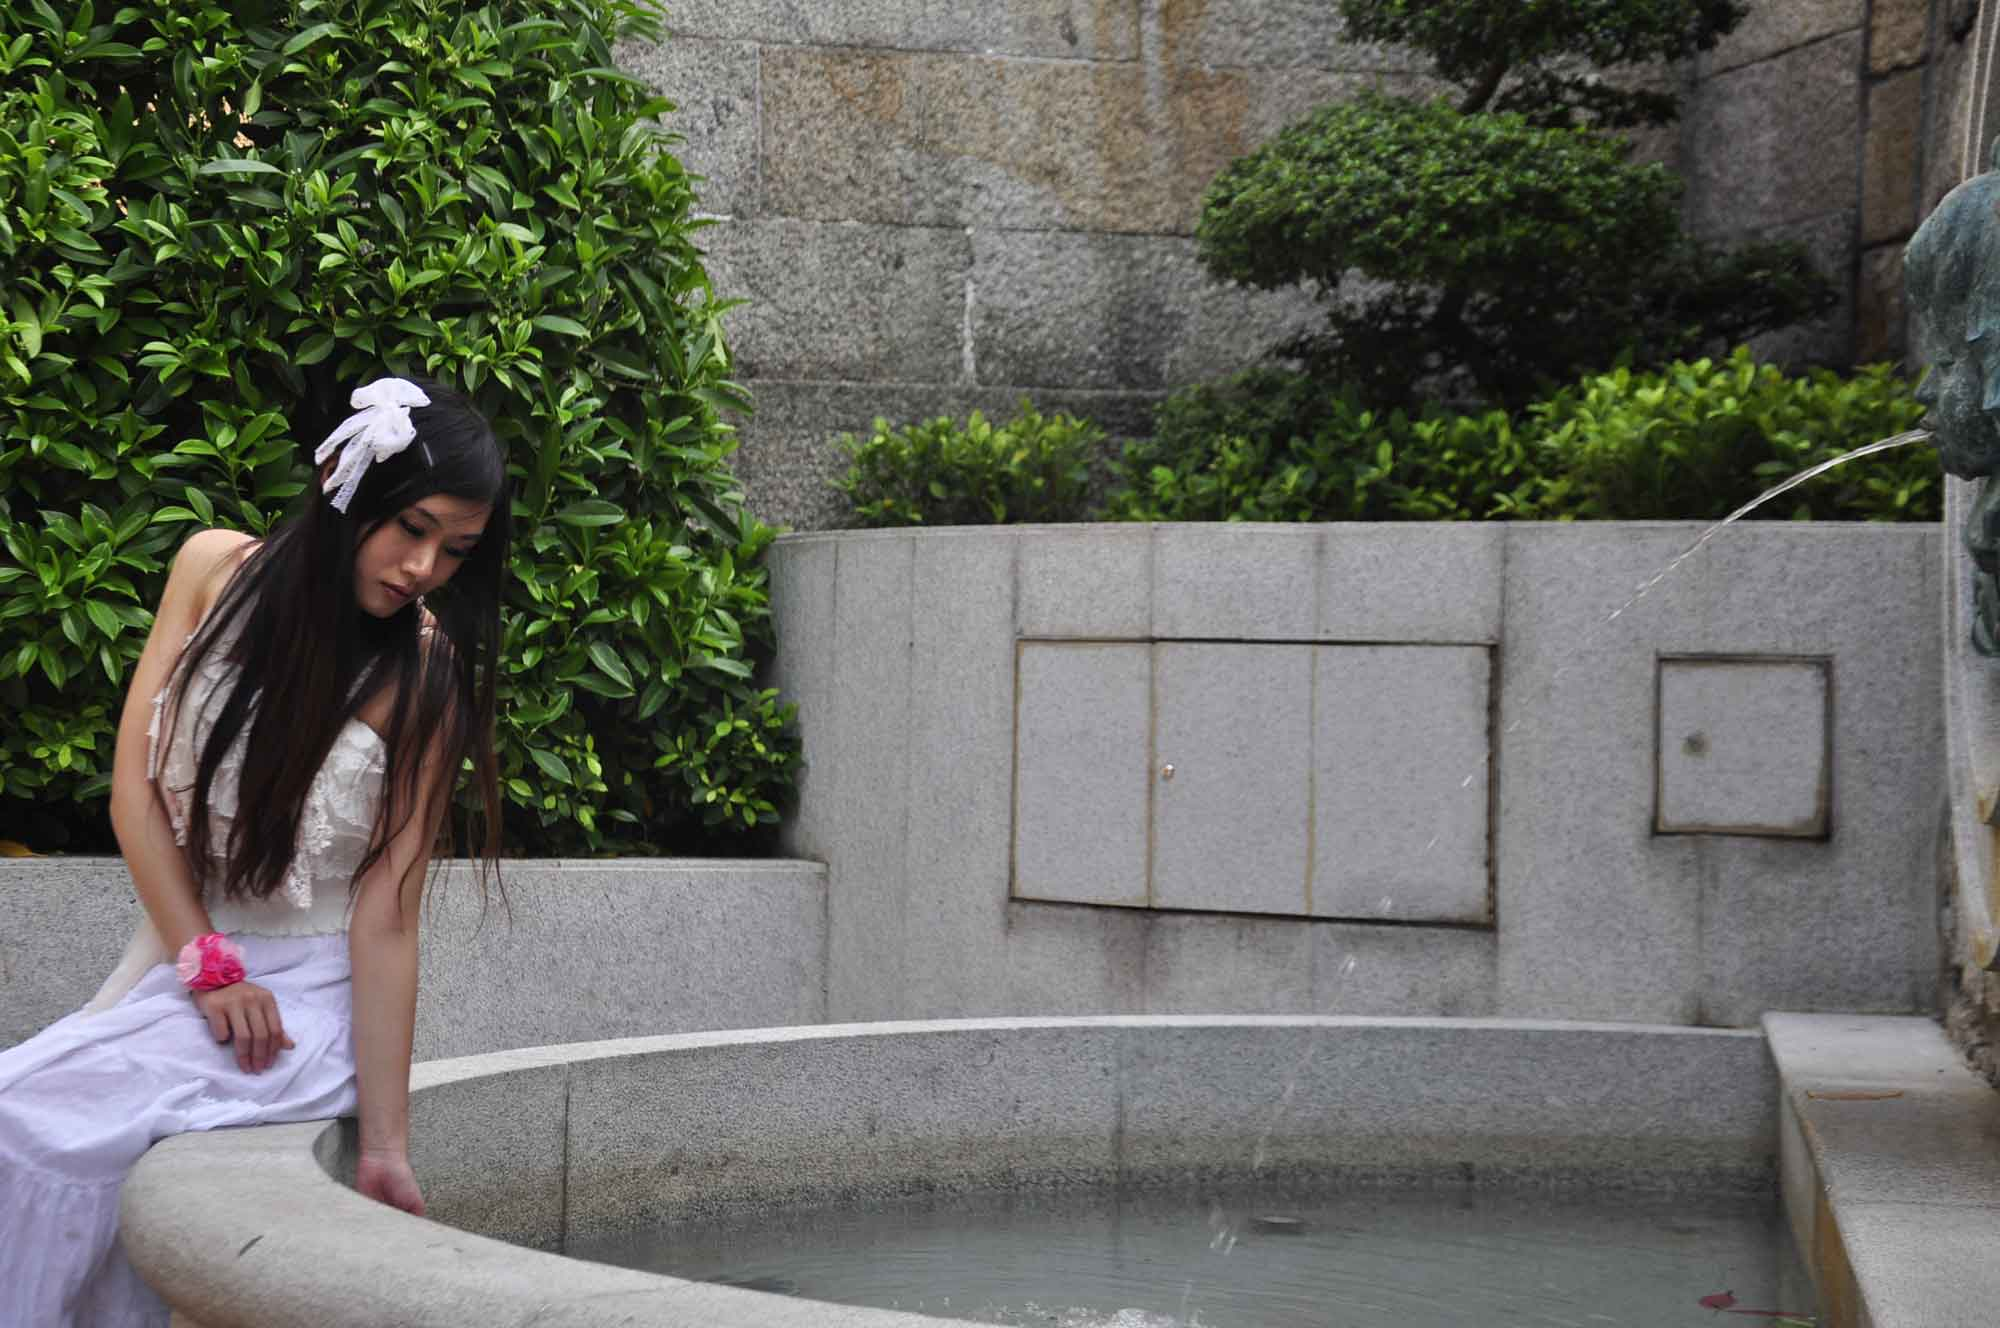 Macau world heritage site: Lilau square fountain